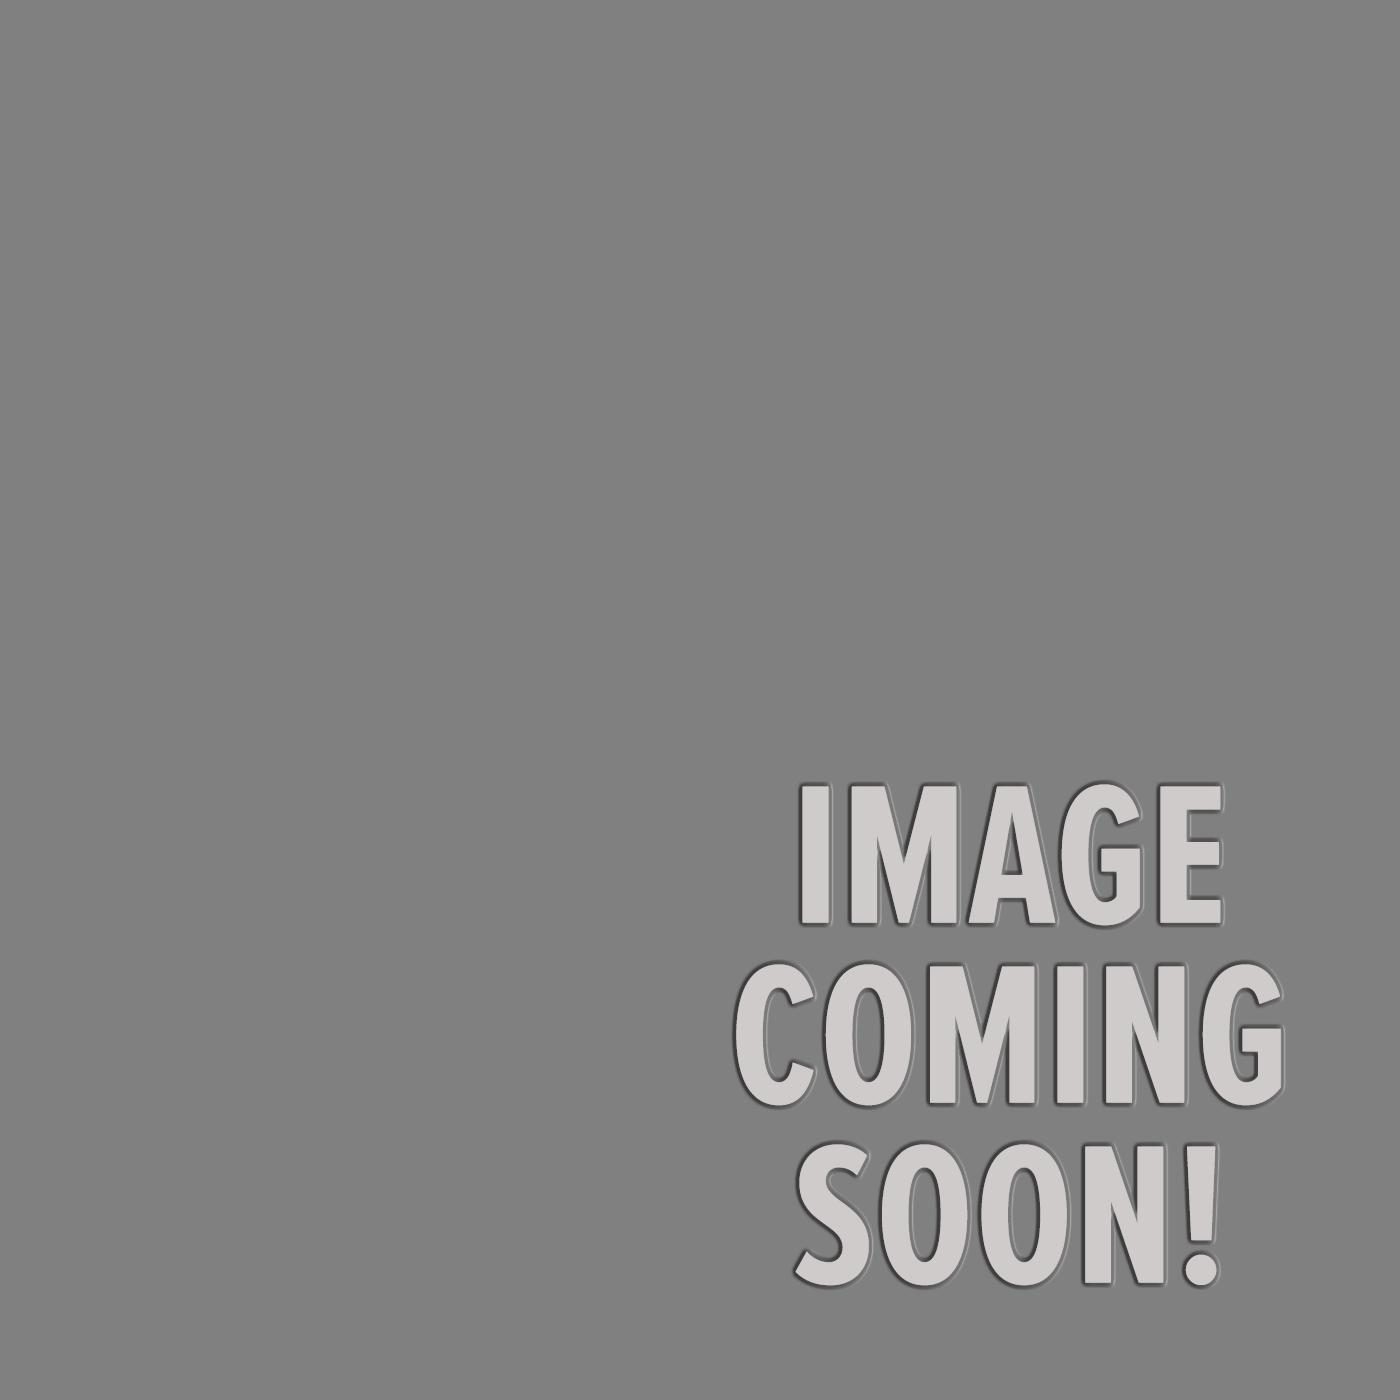 Image for Mini Strat V2 Electric Guitar from SamAsh